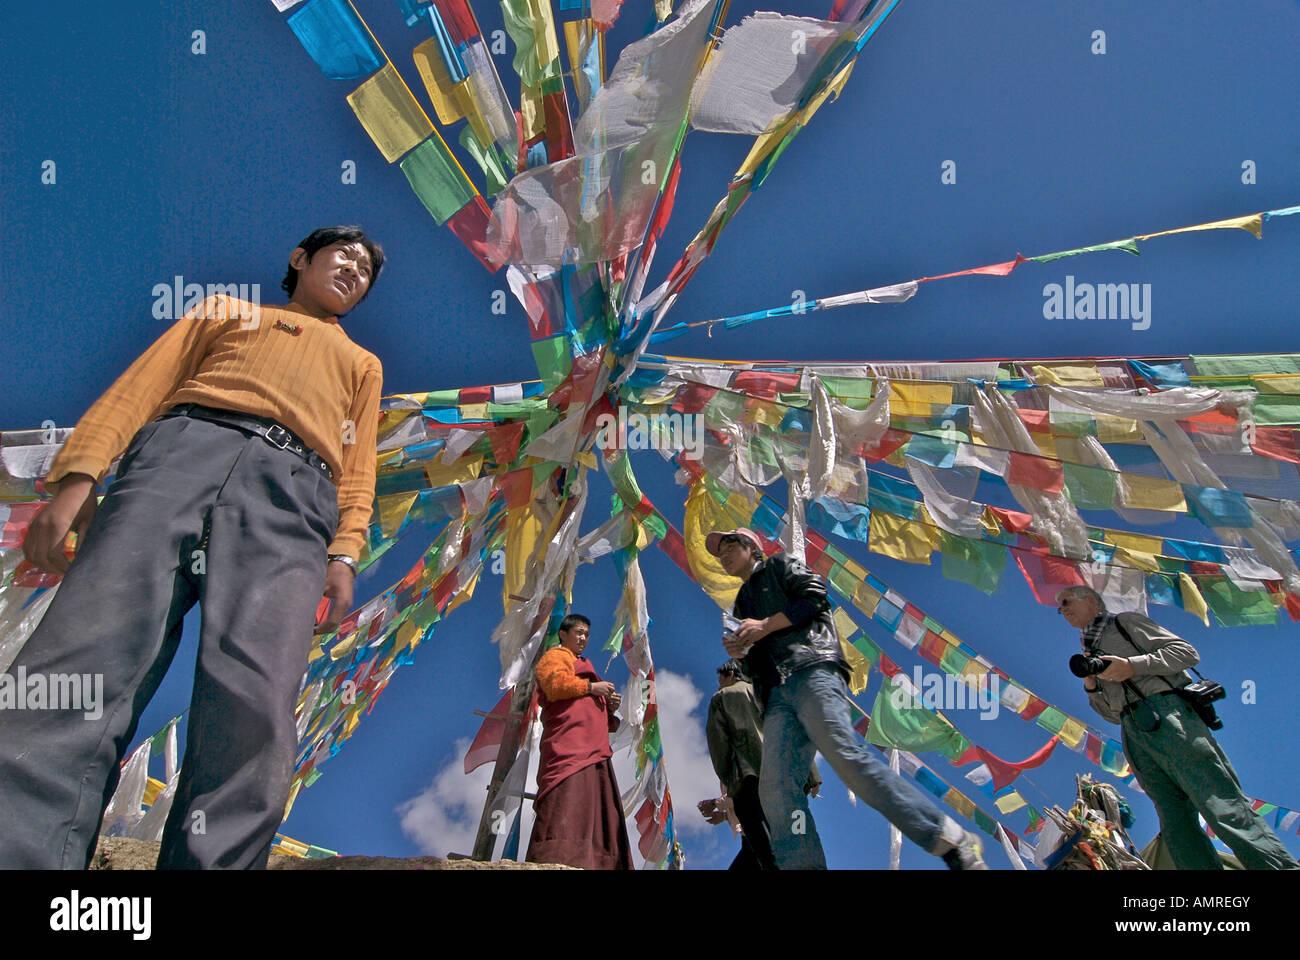 Standing under prayerflags TIBET A young man in western dress a monk and a western photographer Tibet Stock Photo